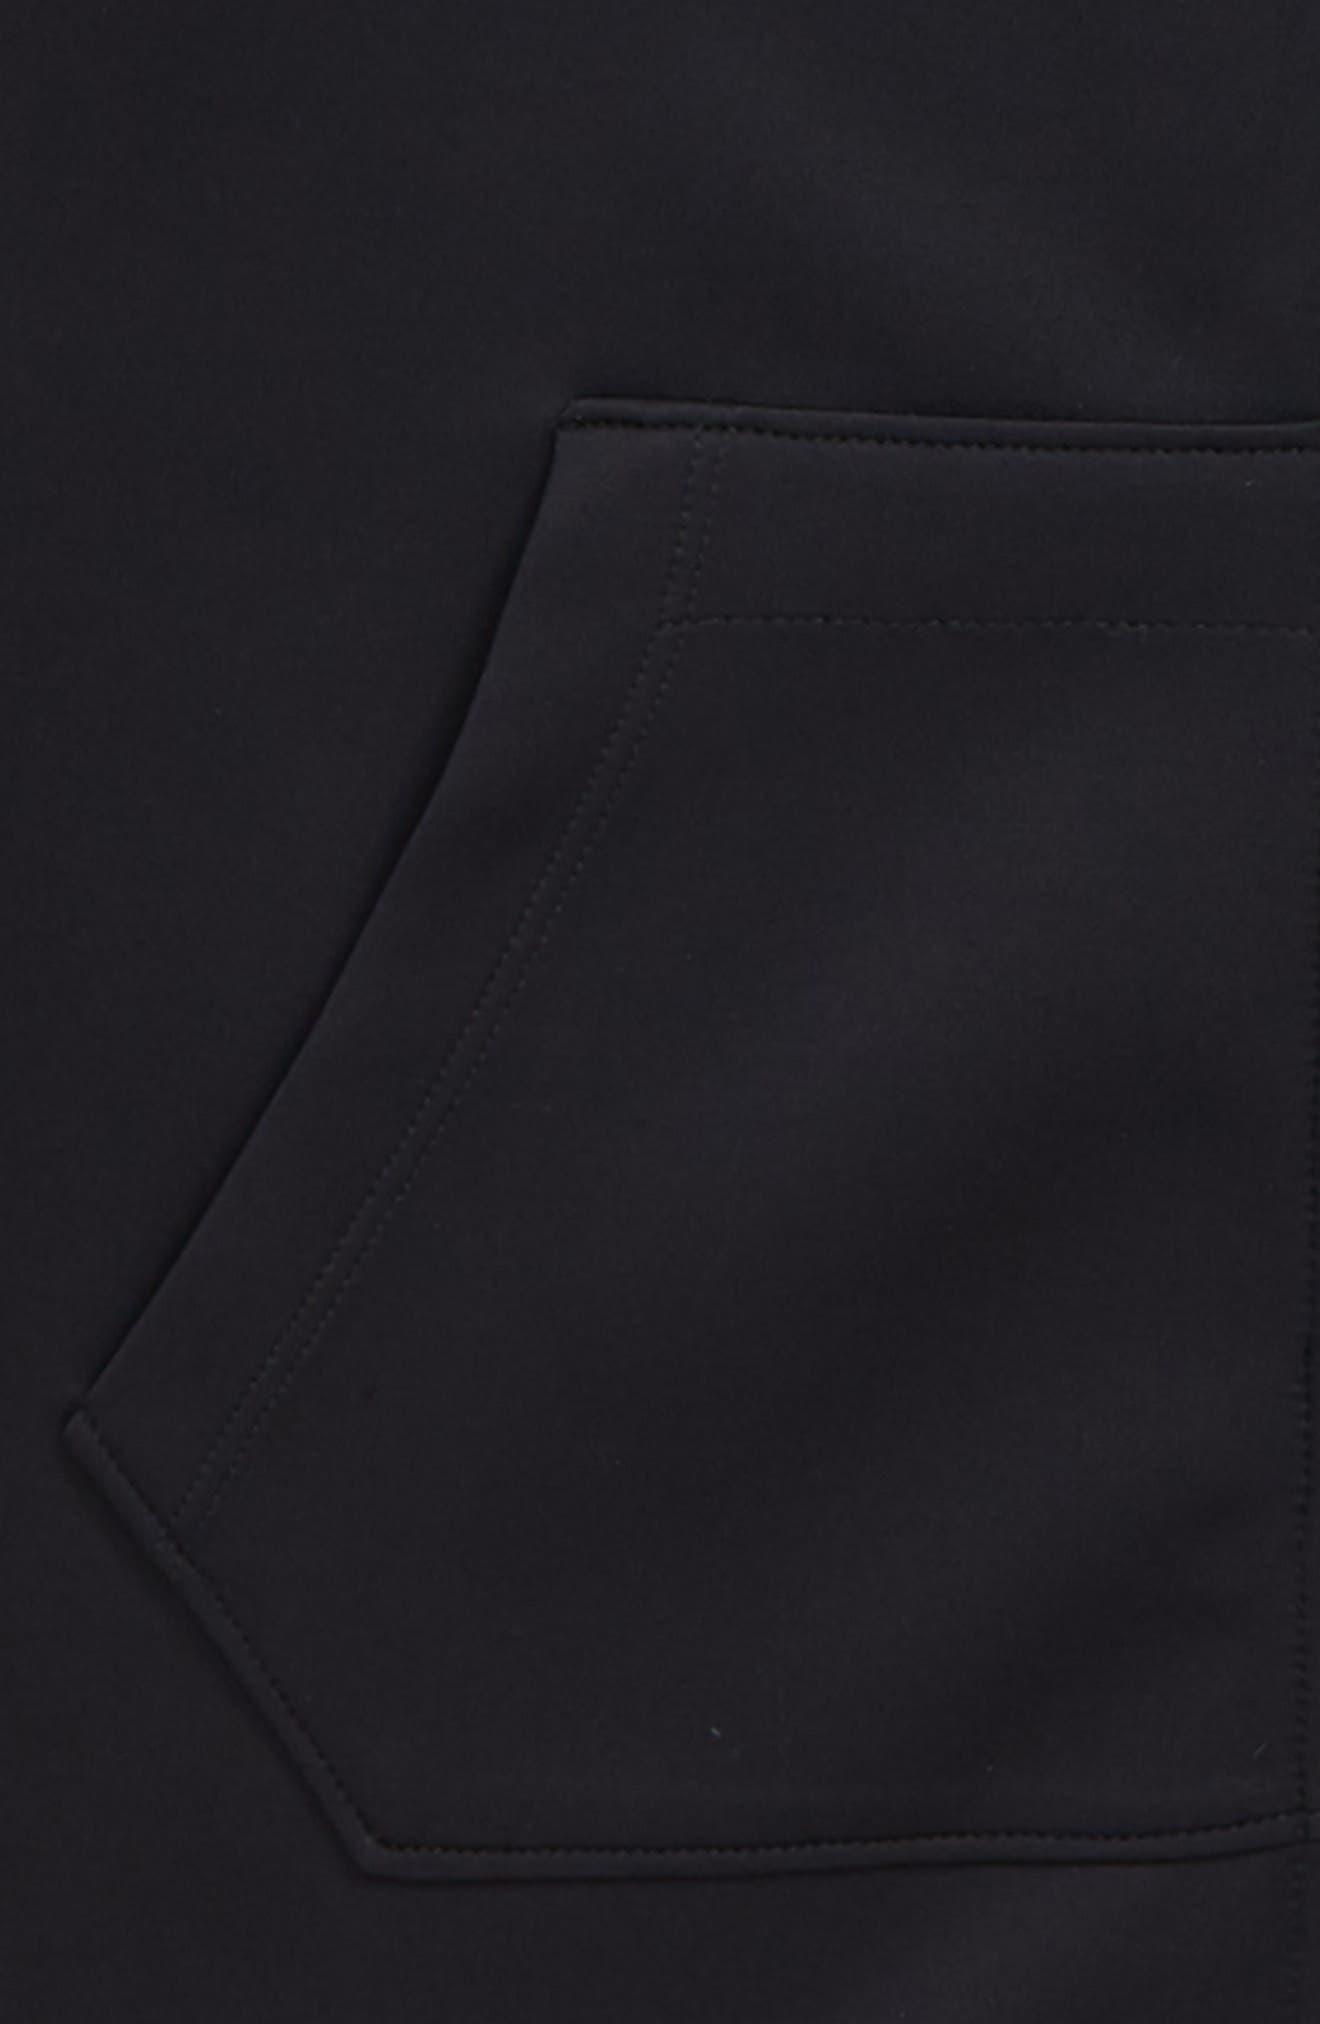 Hooded Zip Jacket,                             Alternate thumbnail 2, color,                             001